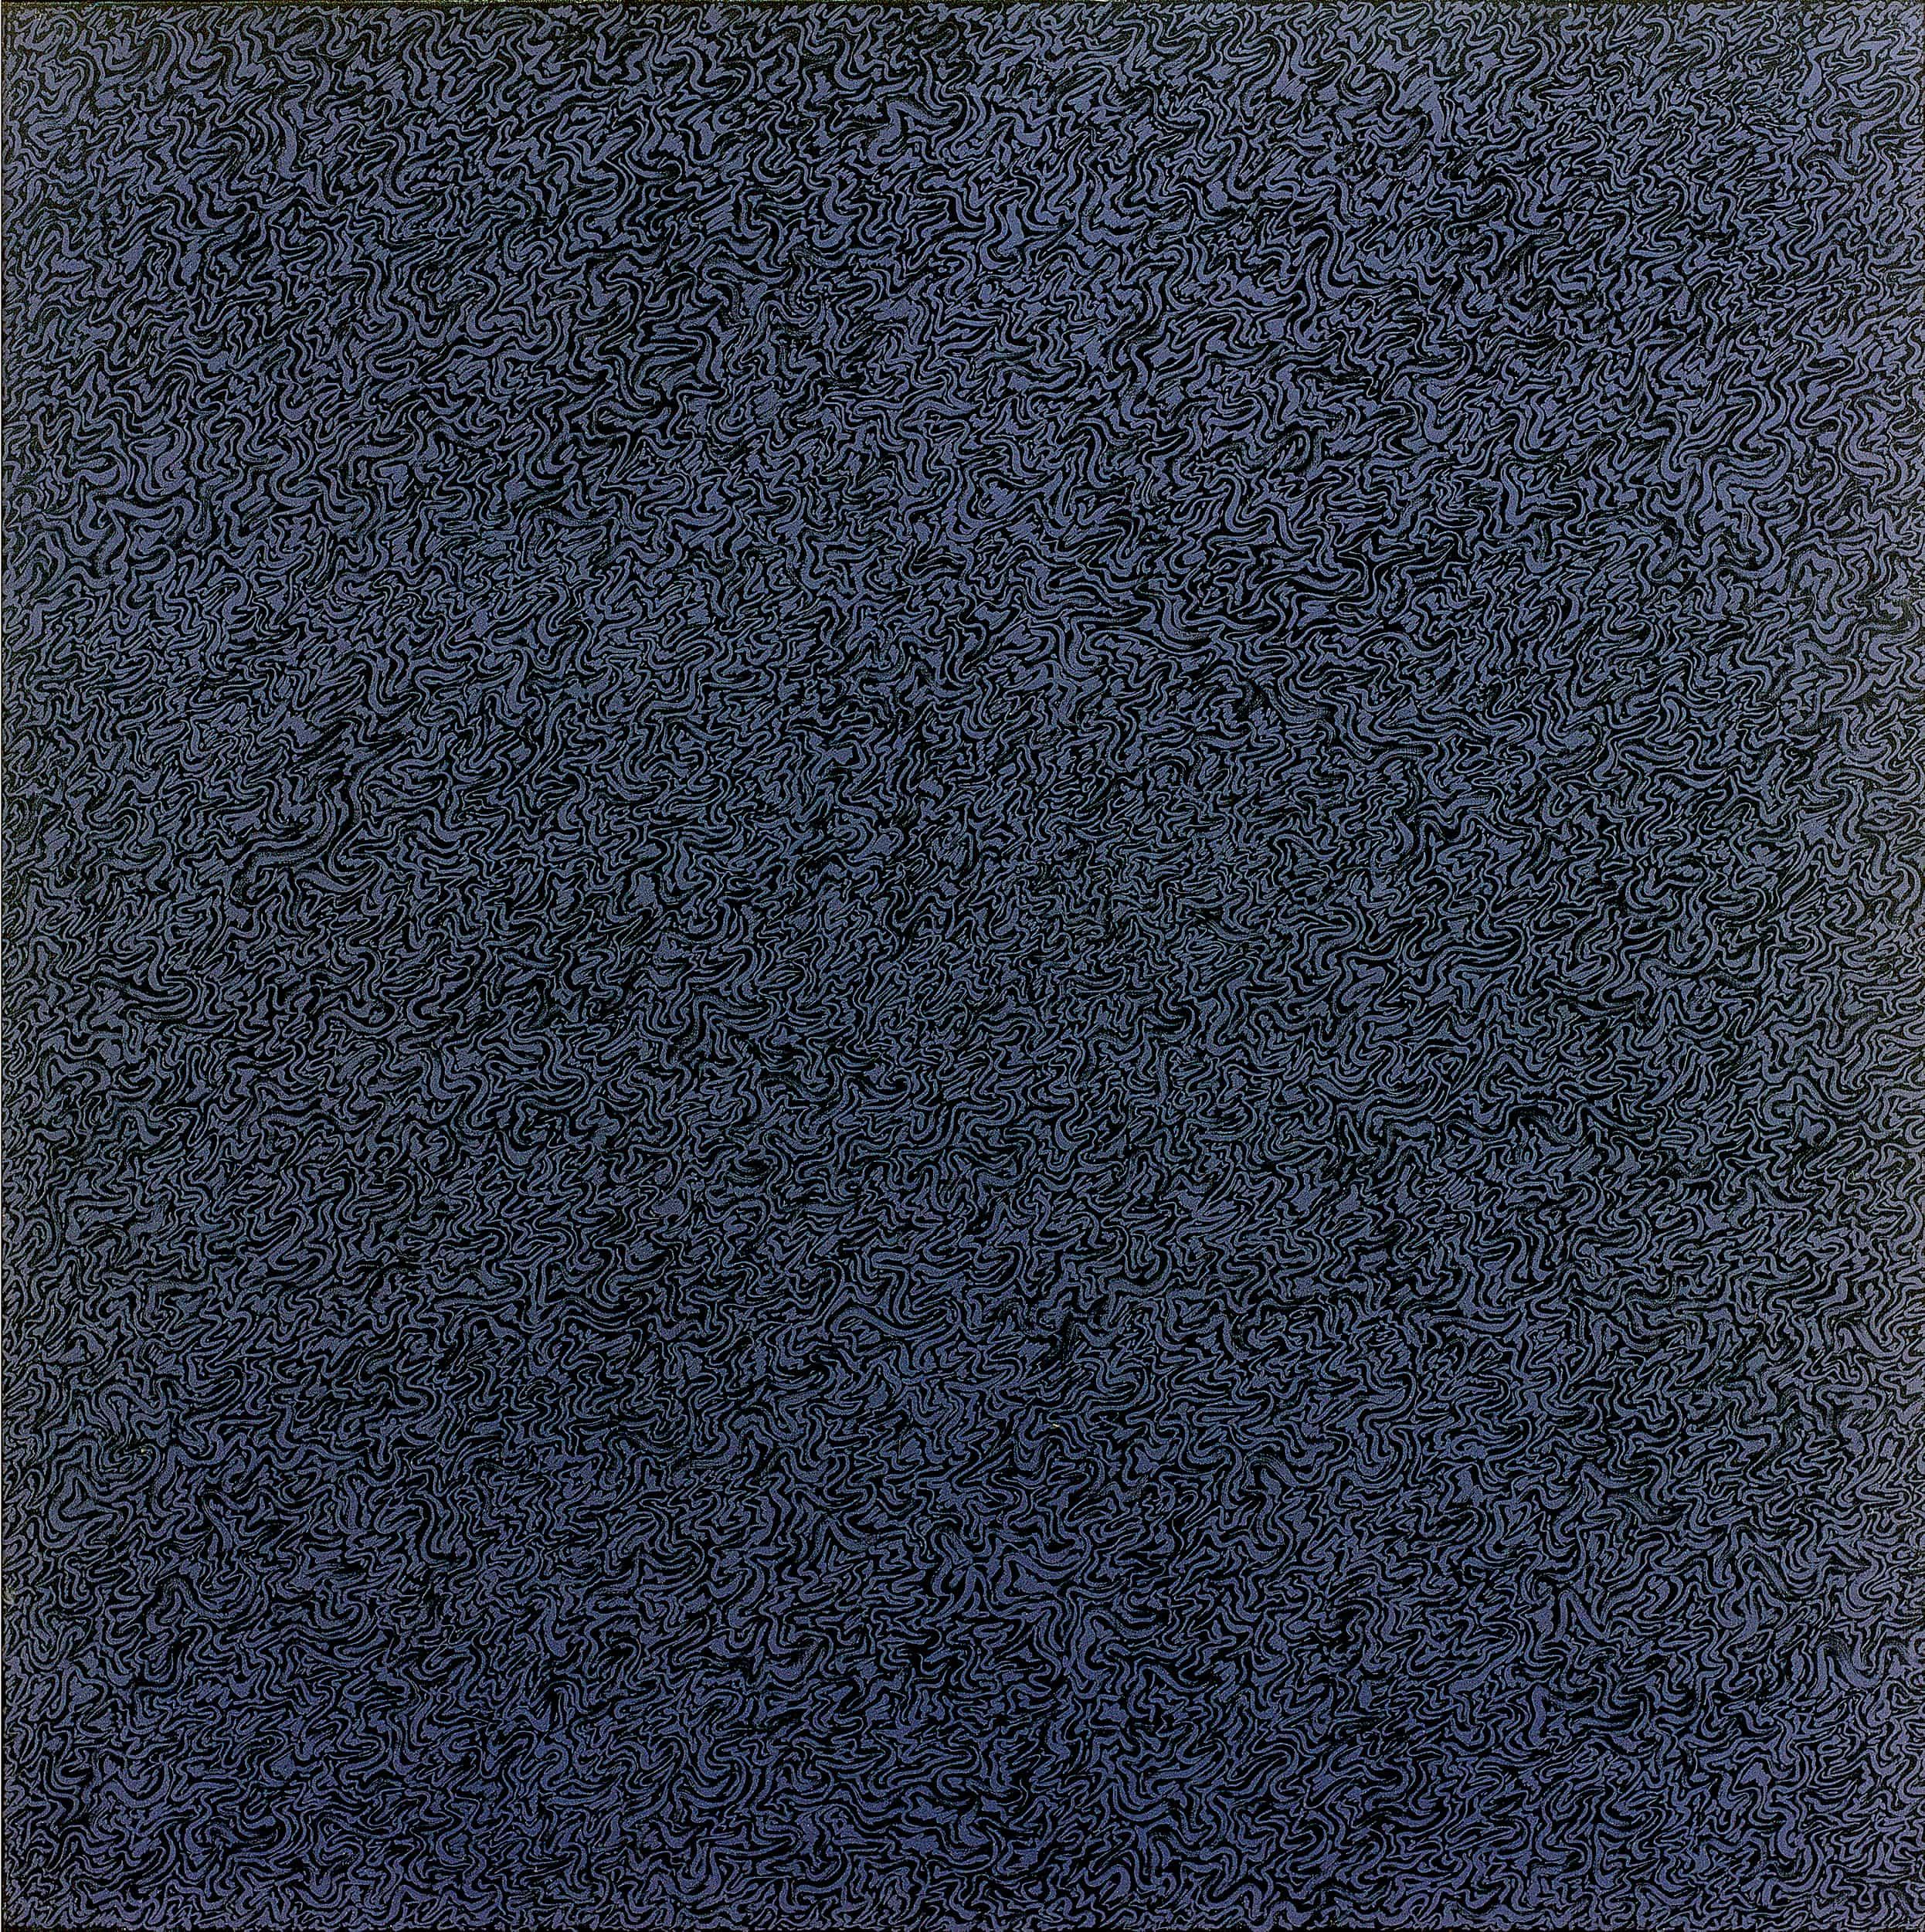 Boille - Continuum blu